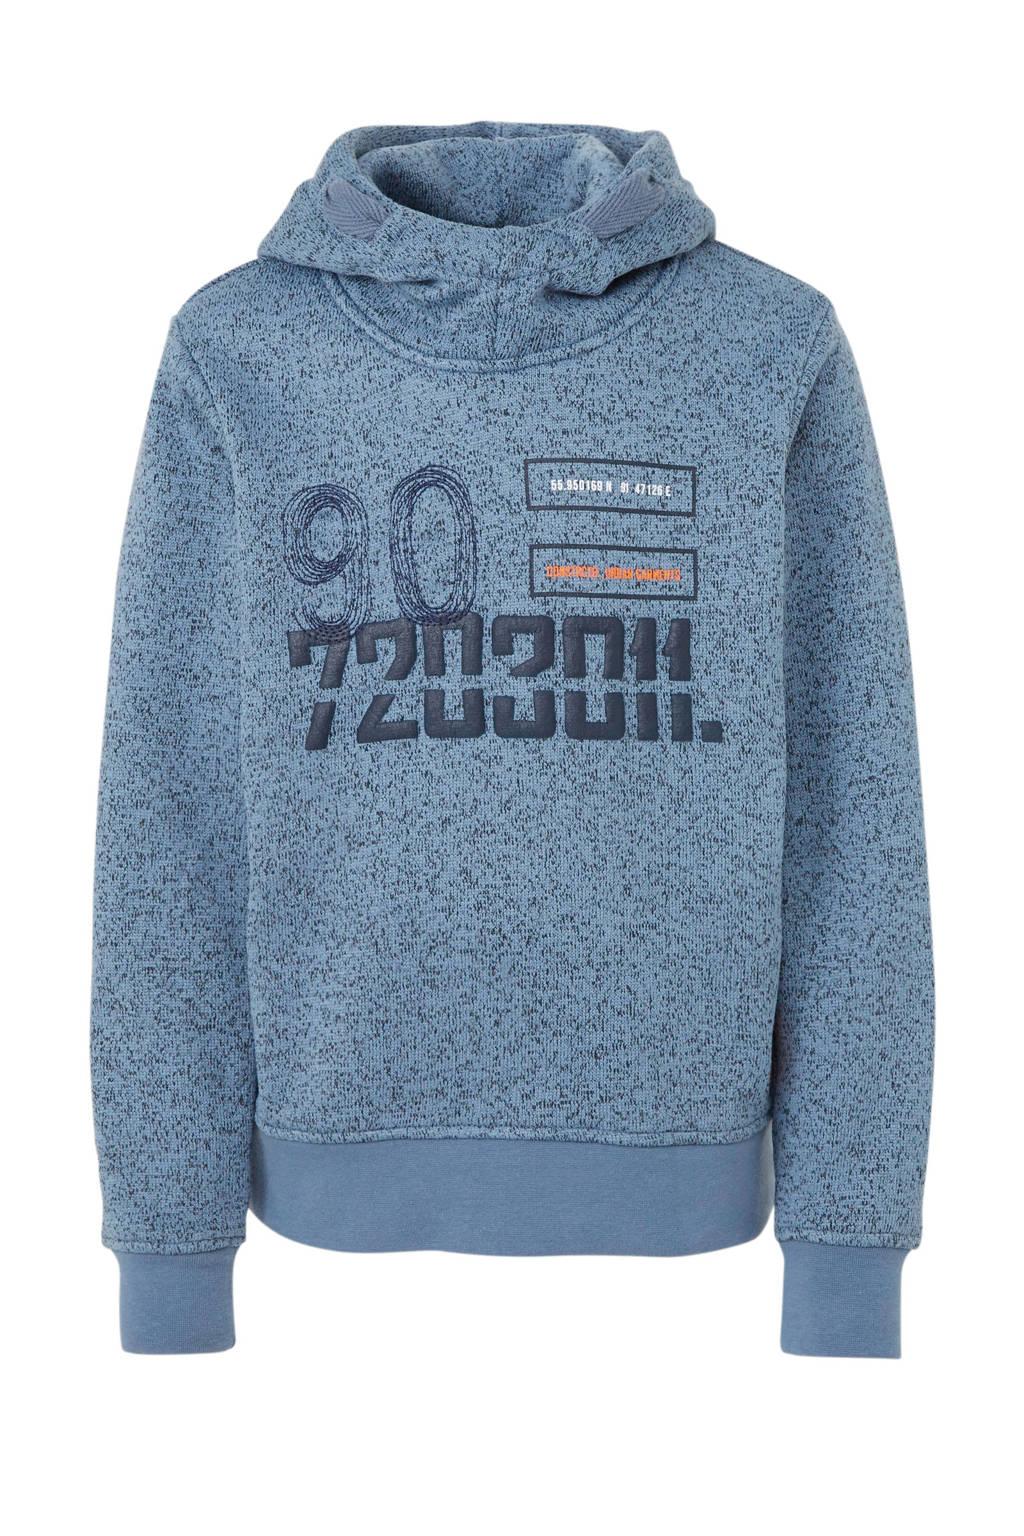 JACK & JONES JUNIOR gebreide hoodie met tekst en borduursels lichtblauw/donkerblauw, Lichtblauw/donkerblauw